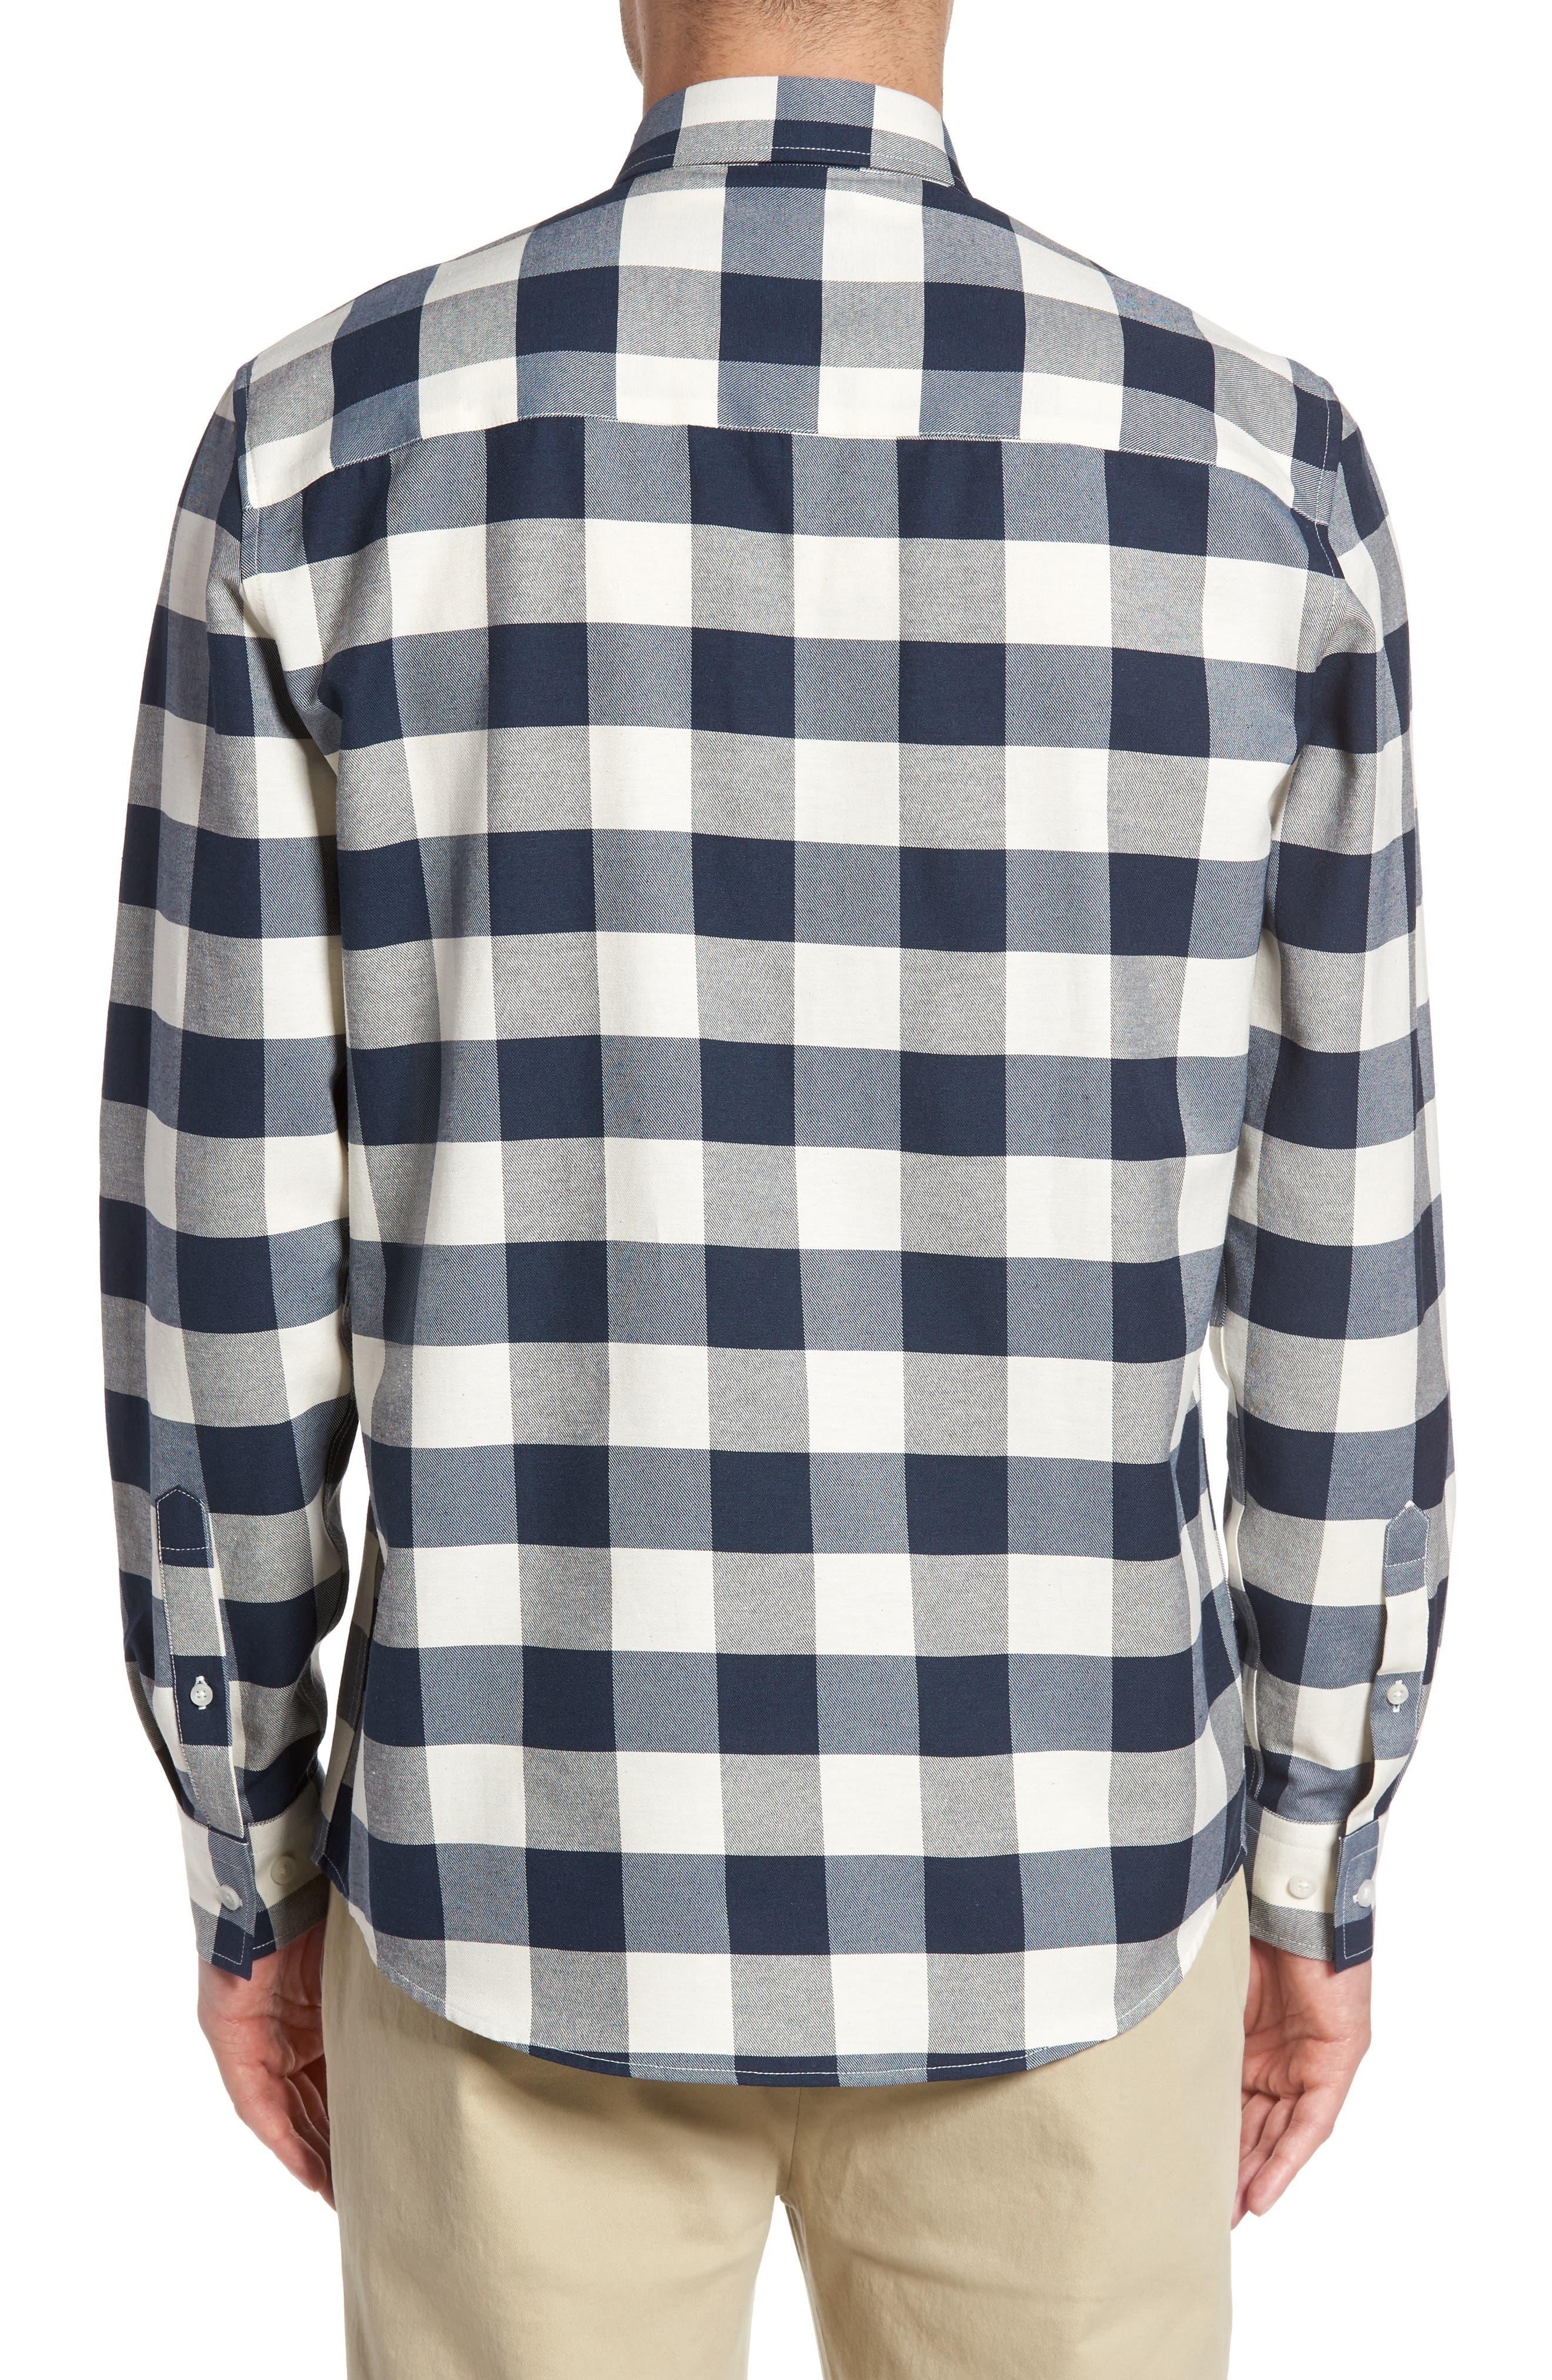 Alternate Image 2  - Topman Check Twill Shirt